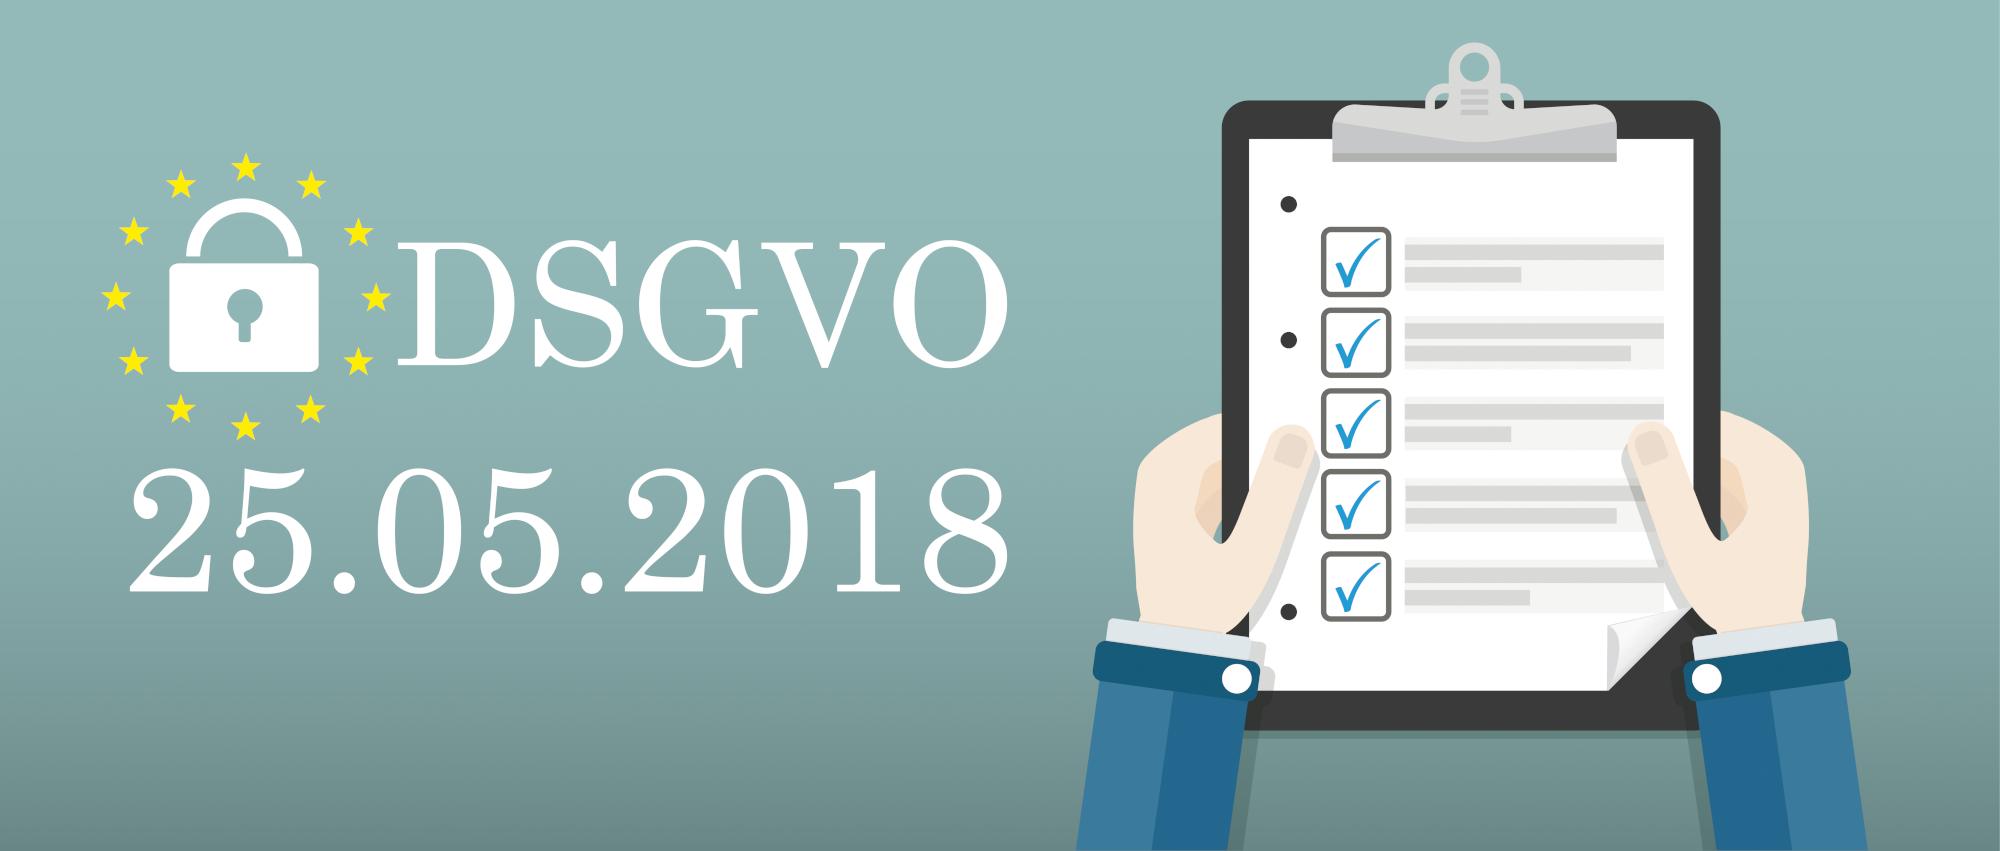 DSGVO Datenschutzgrundverordnung Clipbord Schloss